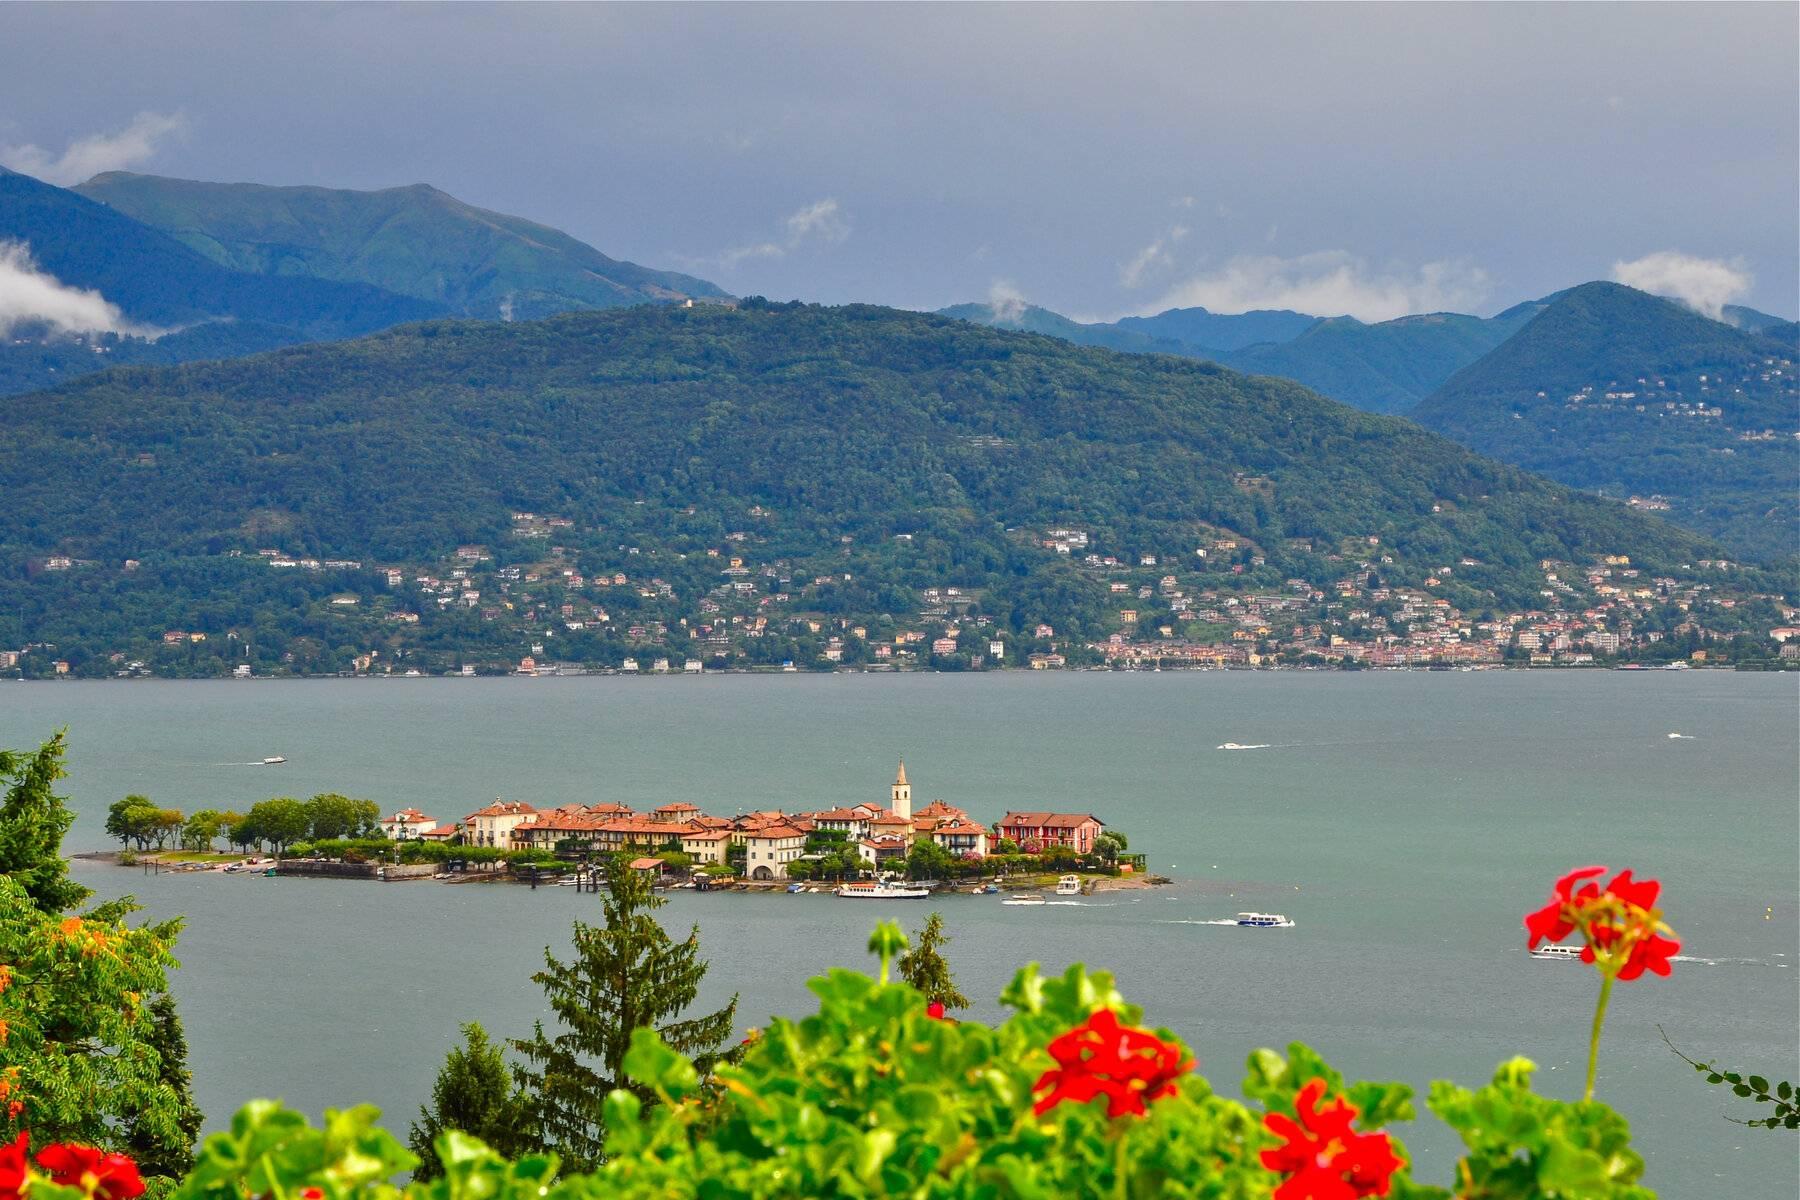 Villa in Vendita a Stresa: 5 locali, 364 mq - Foto 1